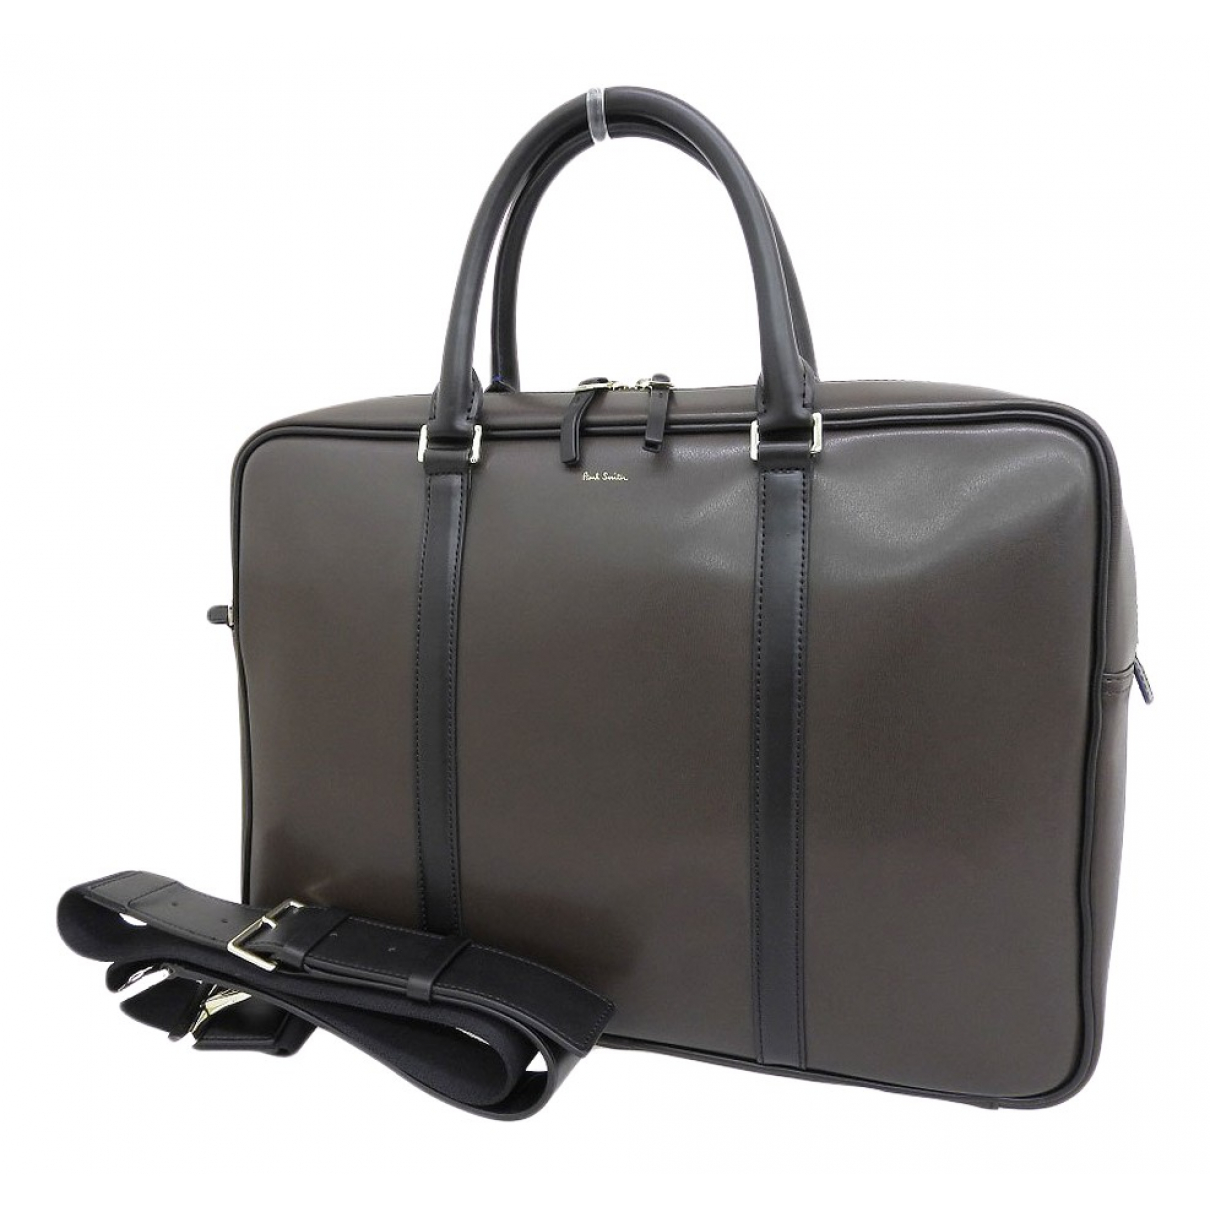 Paul Smith \N Brown Leather bag for Men \N